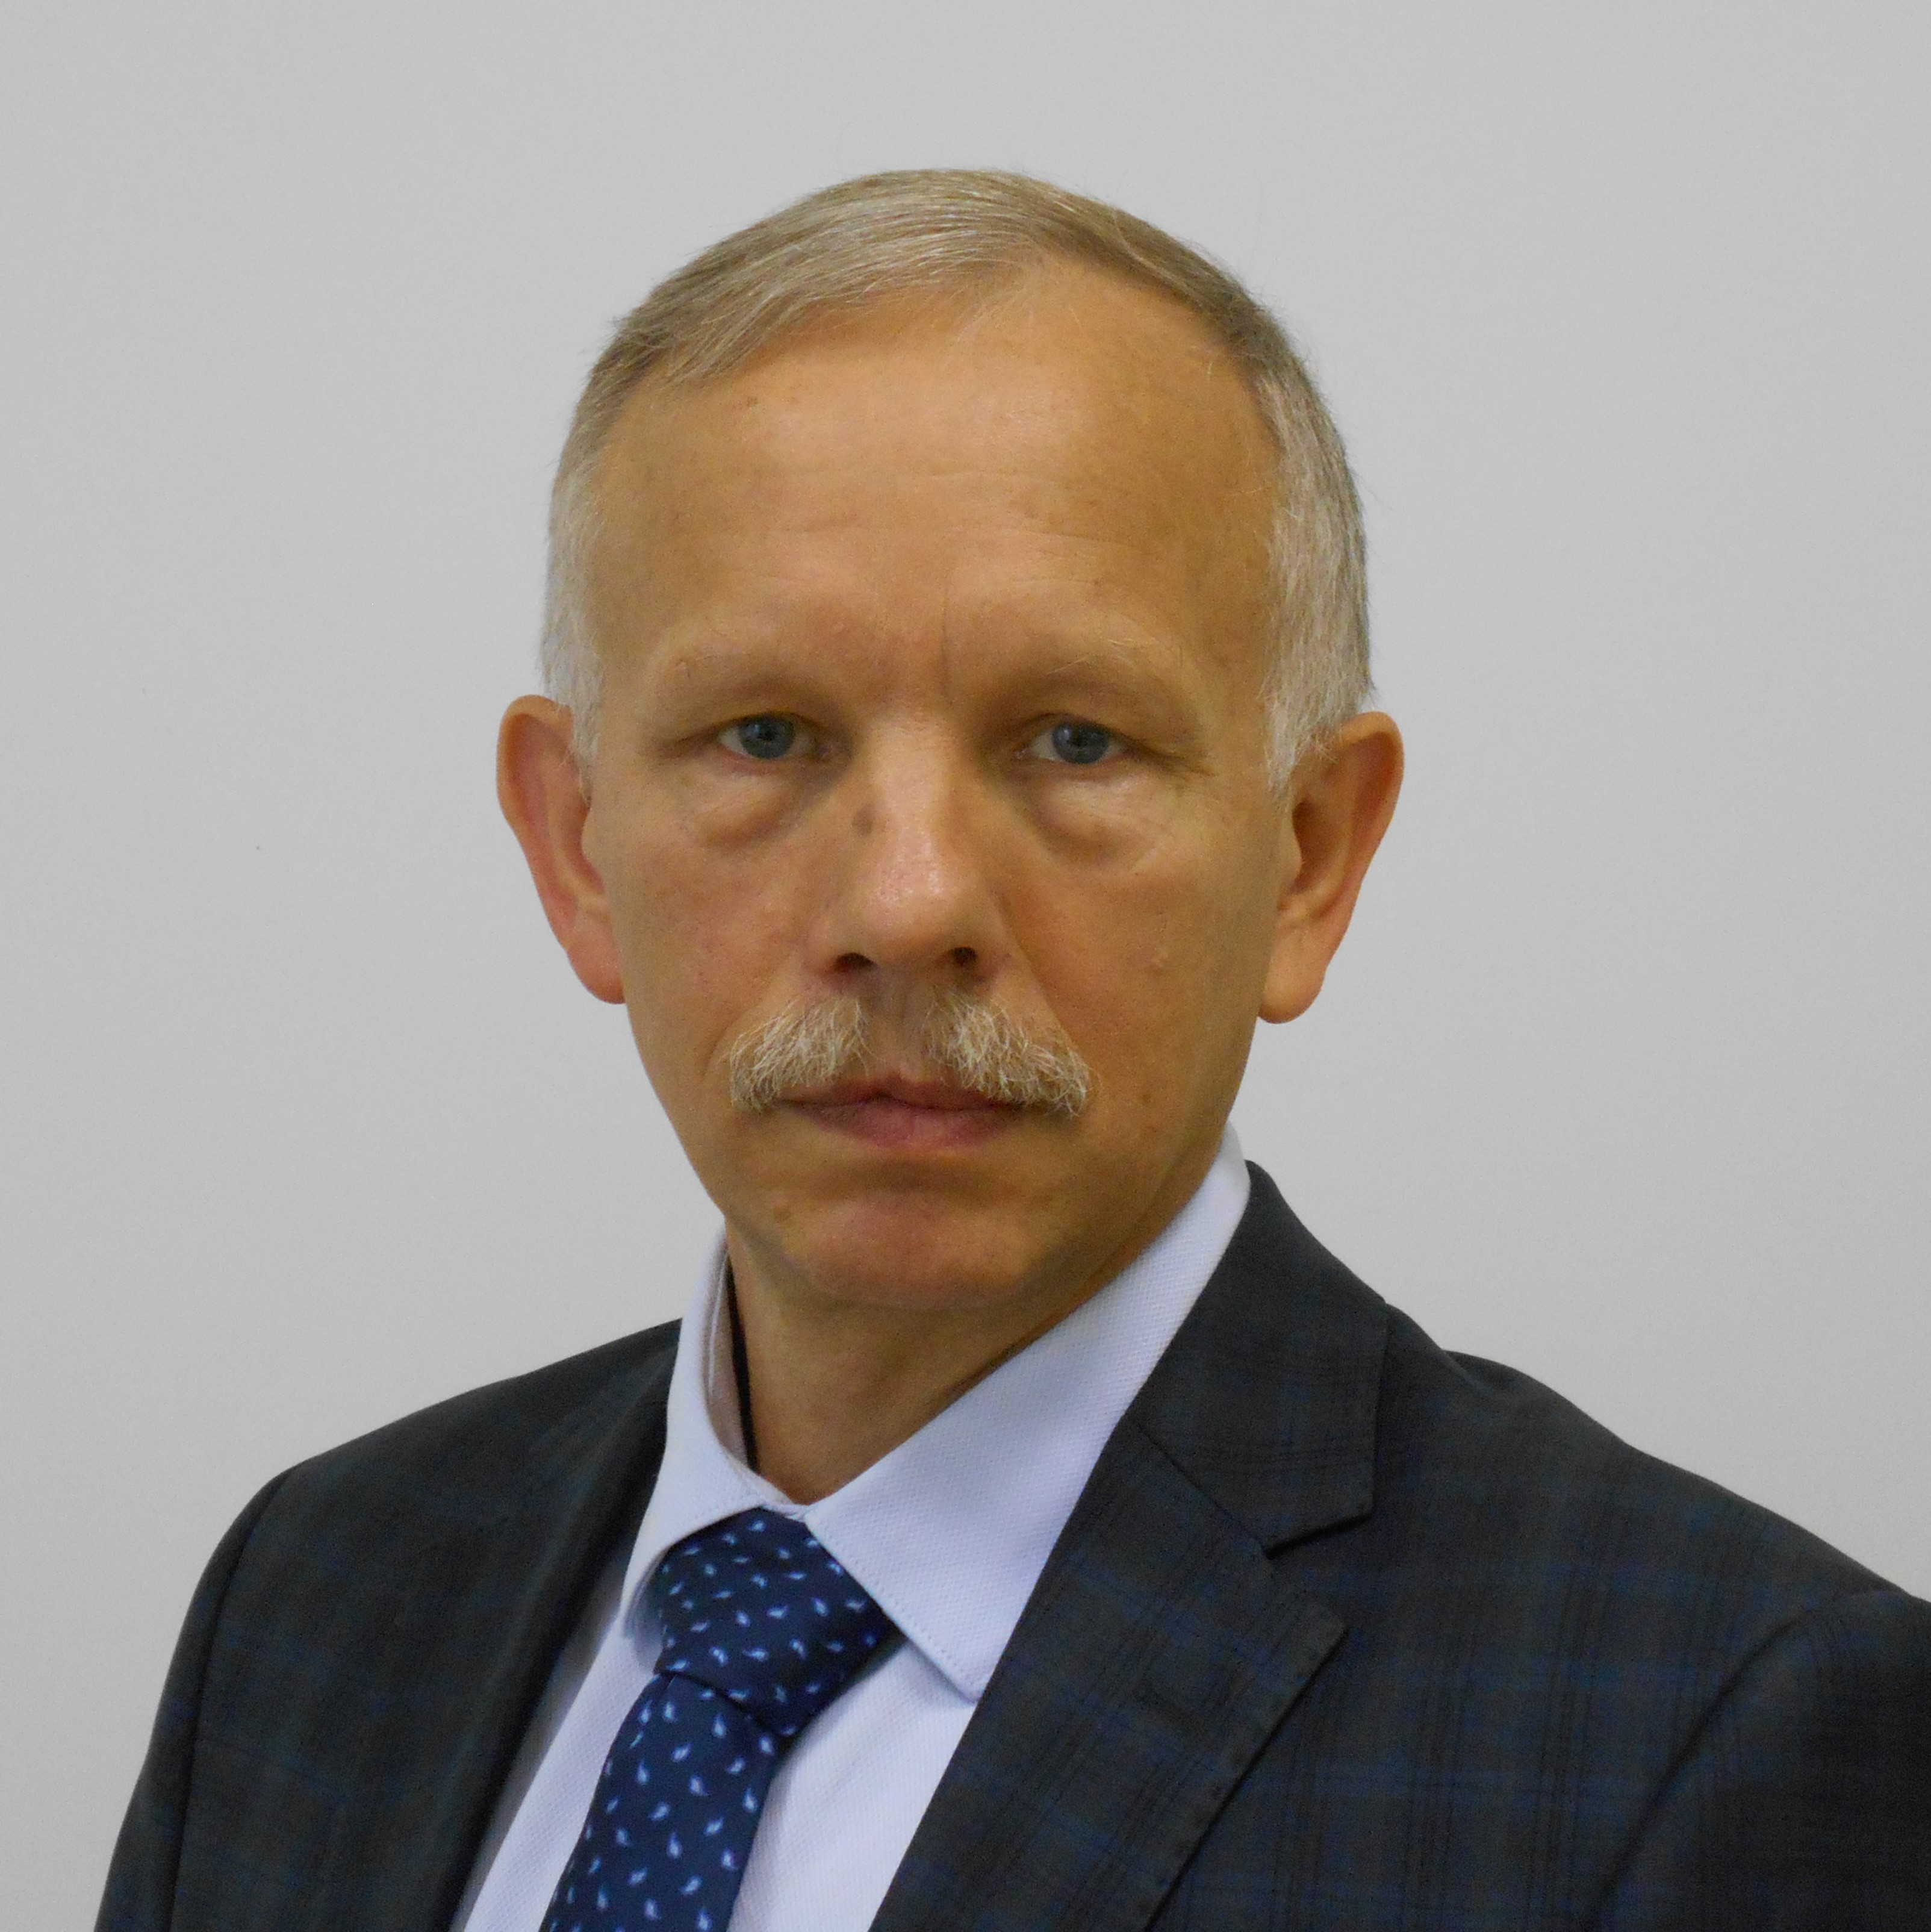 Поставнев Владимир Михайлович